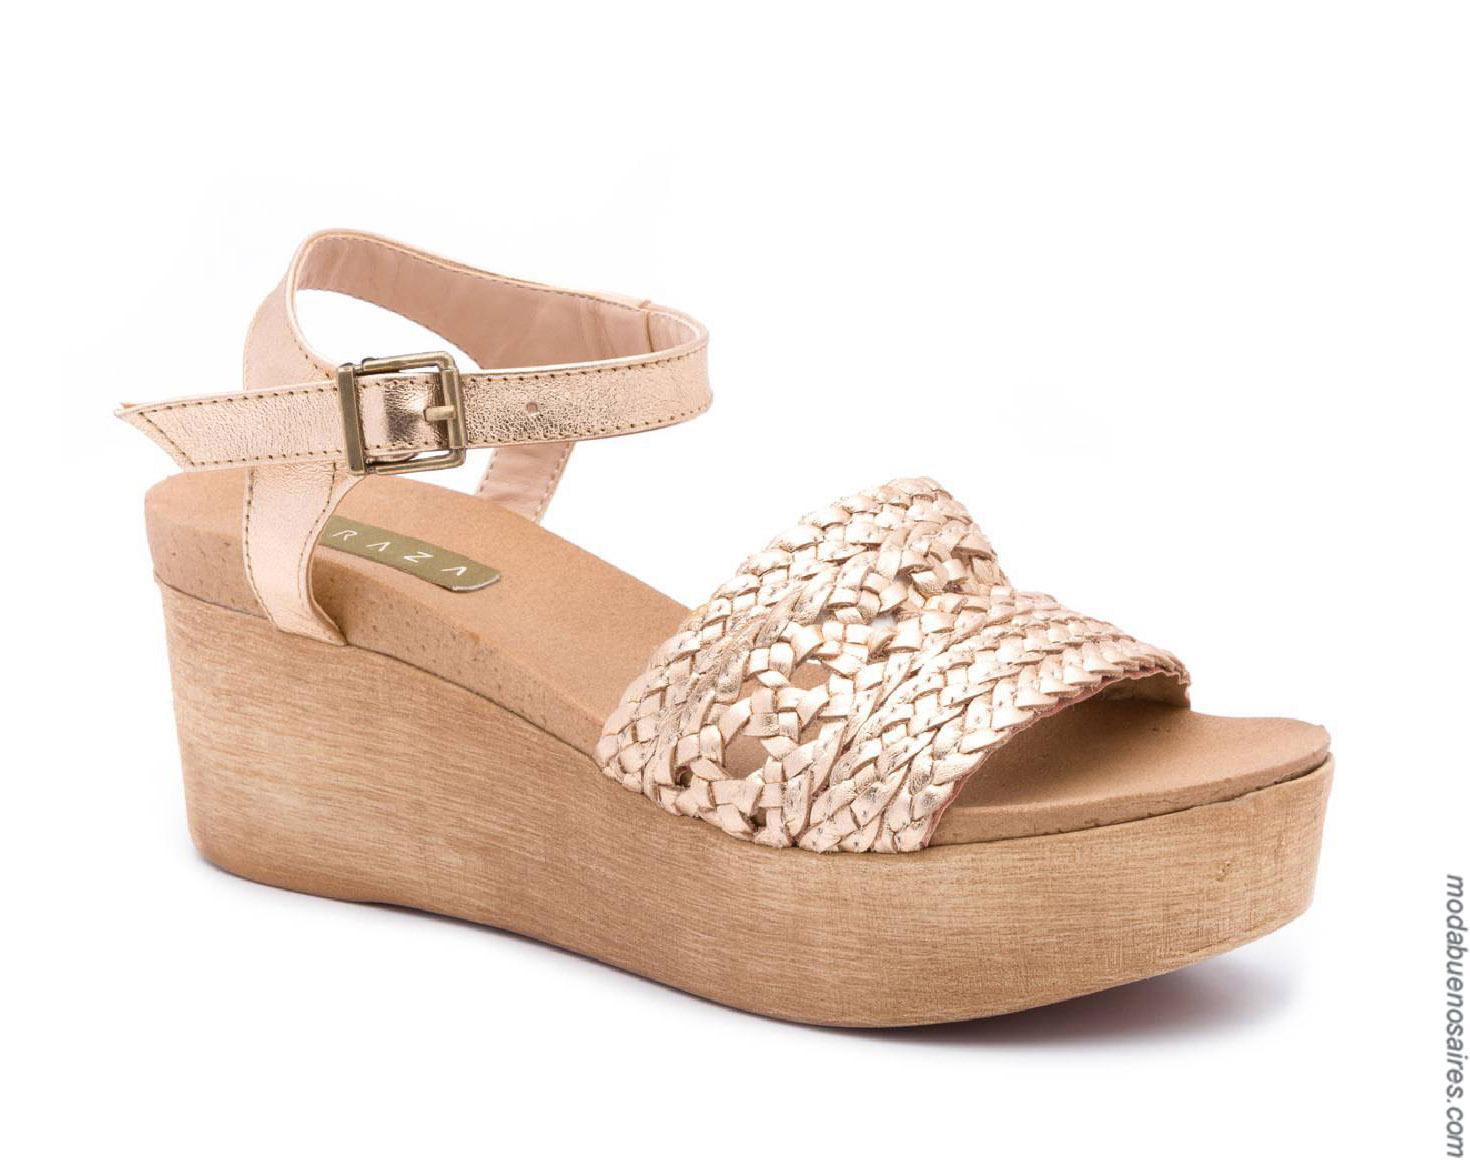 Moda calzado femenino primavera verano 2020.